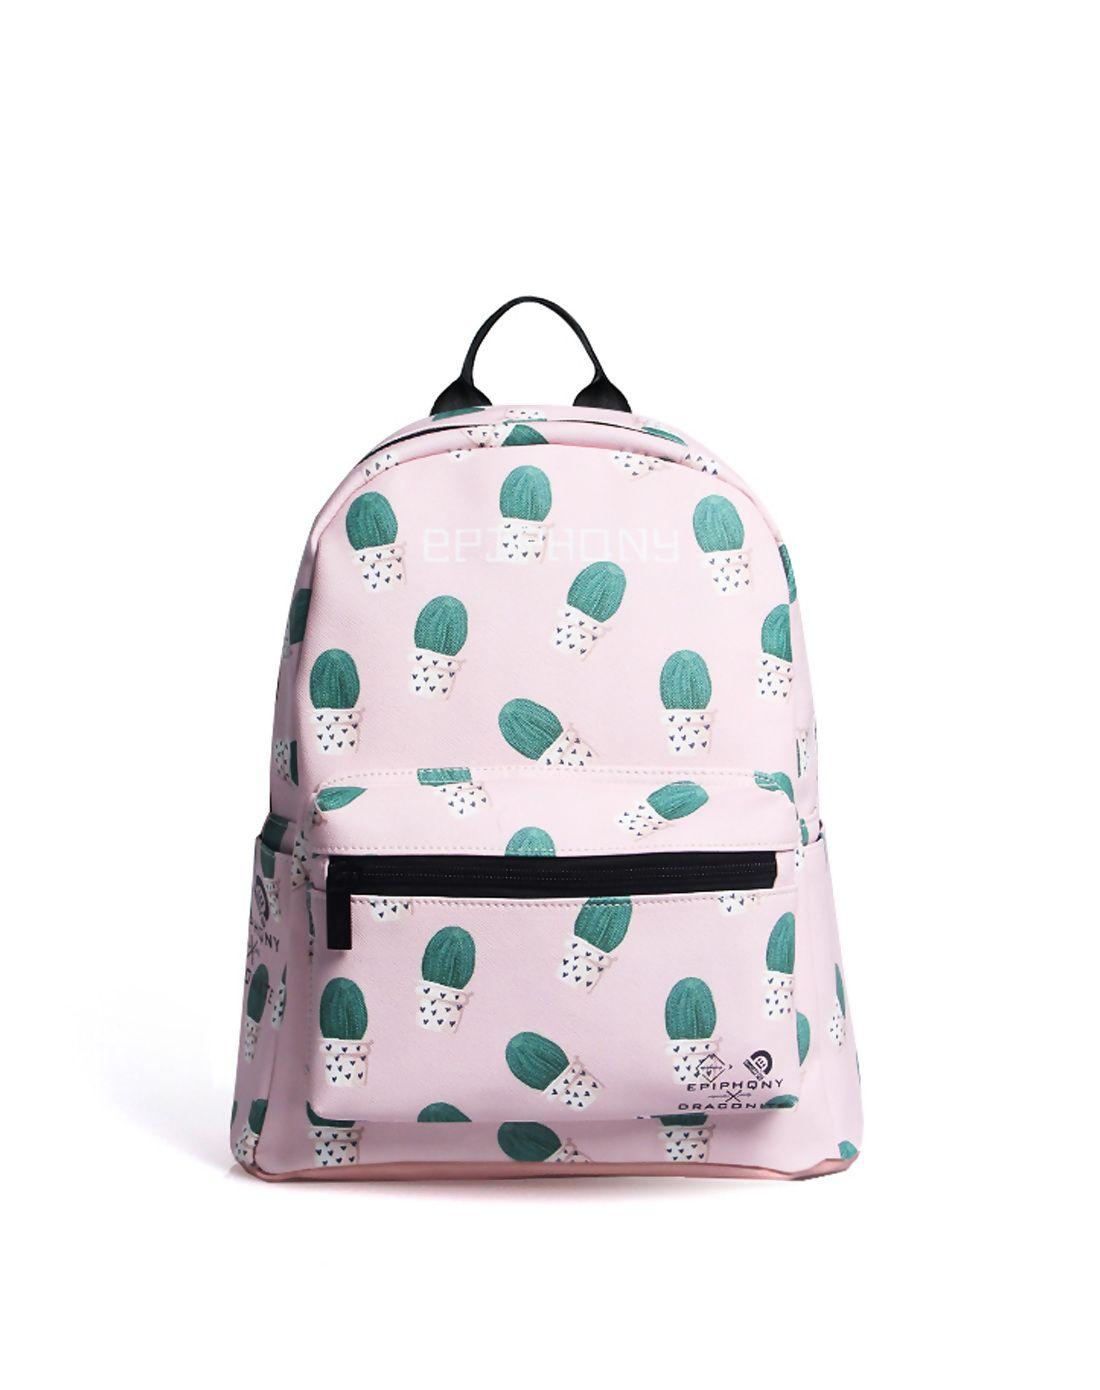 AdoreWe  VIPme Backpacks - EPIPHQNY Cactus Pattern Printing Cute Mini PU  Backpack - AdoreWe.com 7121adc9a2